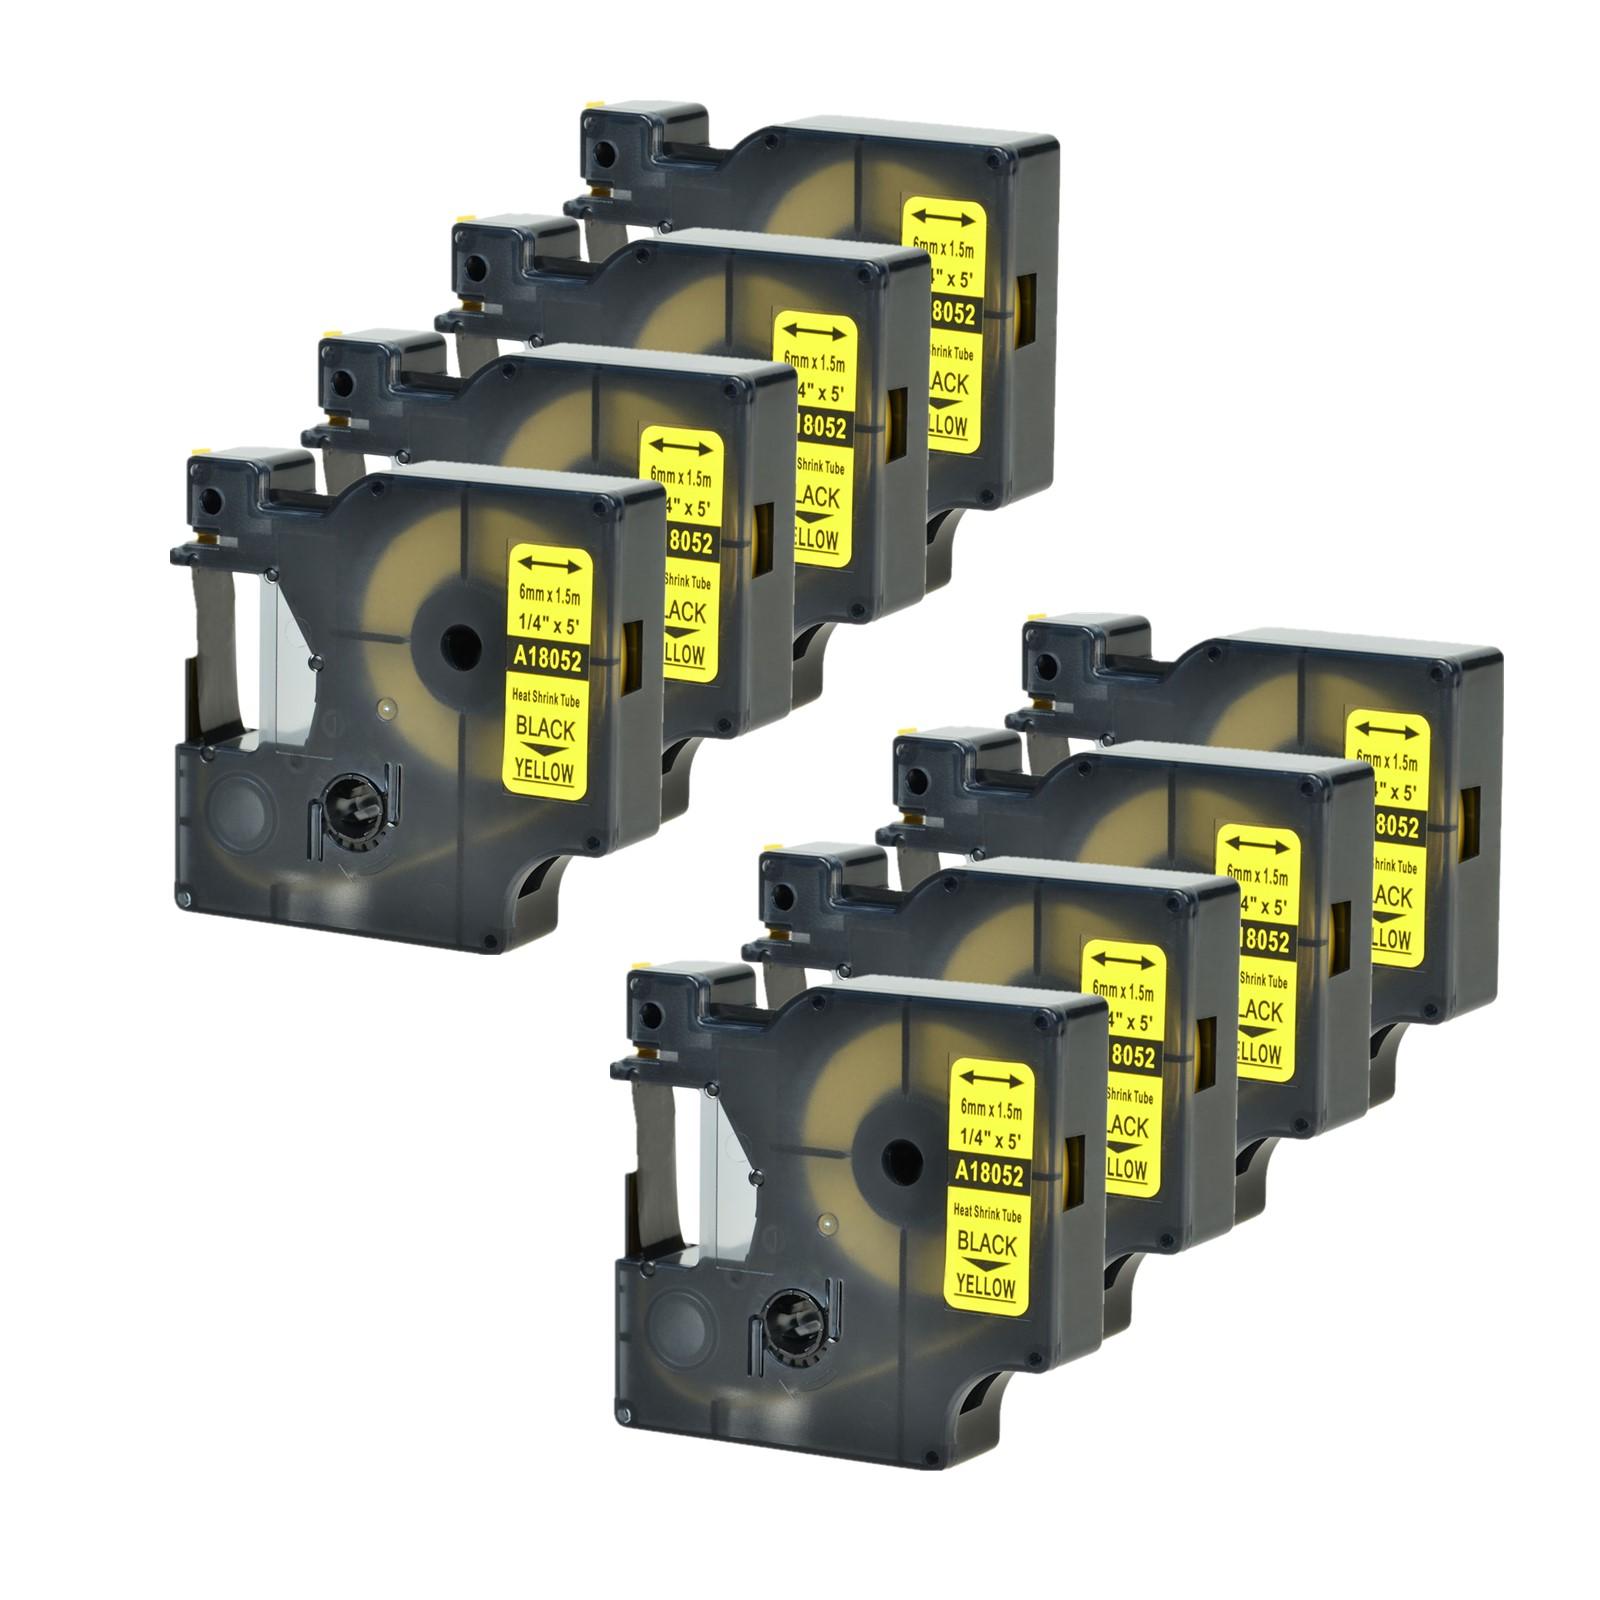 "2PK Heat Shrink Tube Wire Label Cartridge 18052 For Dymo RHINO 5200 3000 1//4/"""